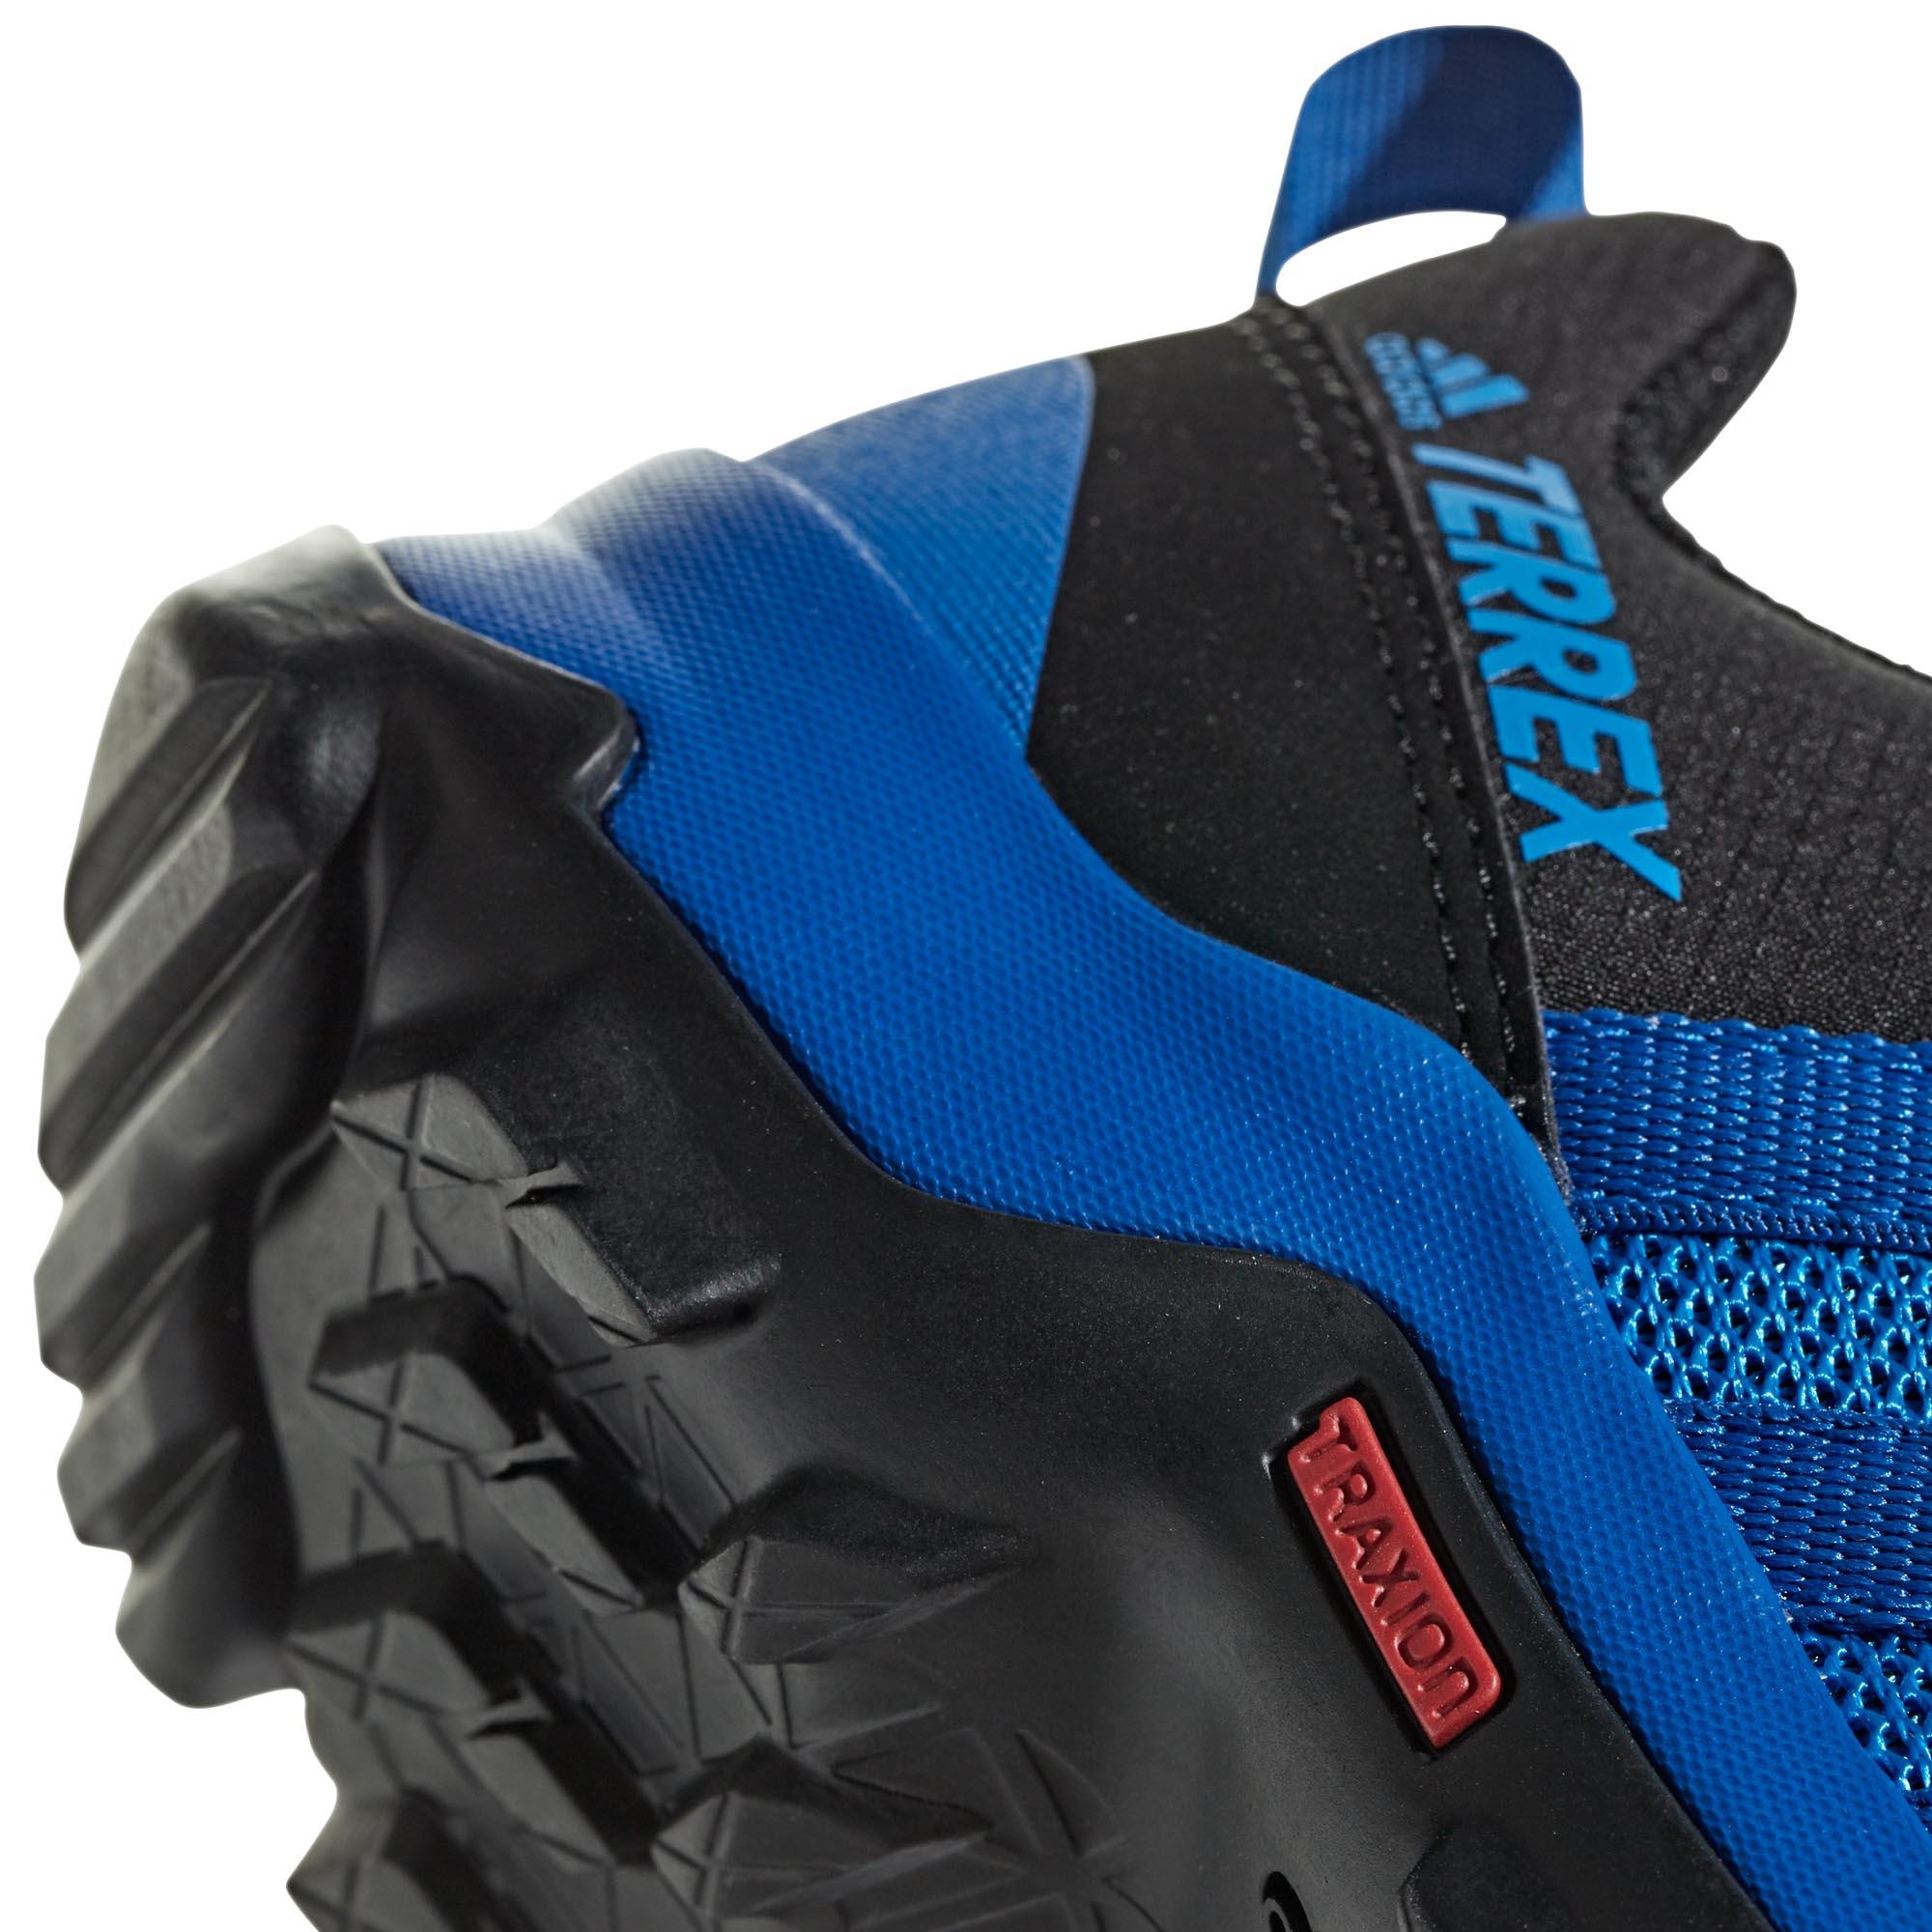 adidas-Terrex-AX2R-Kids-Boys-Trail-Hiking-Trainer-Shoe-Blue-Black thumbnail 9